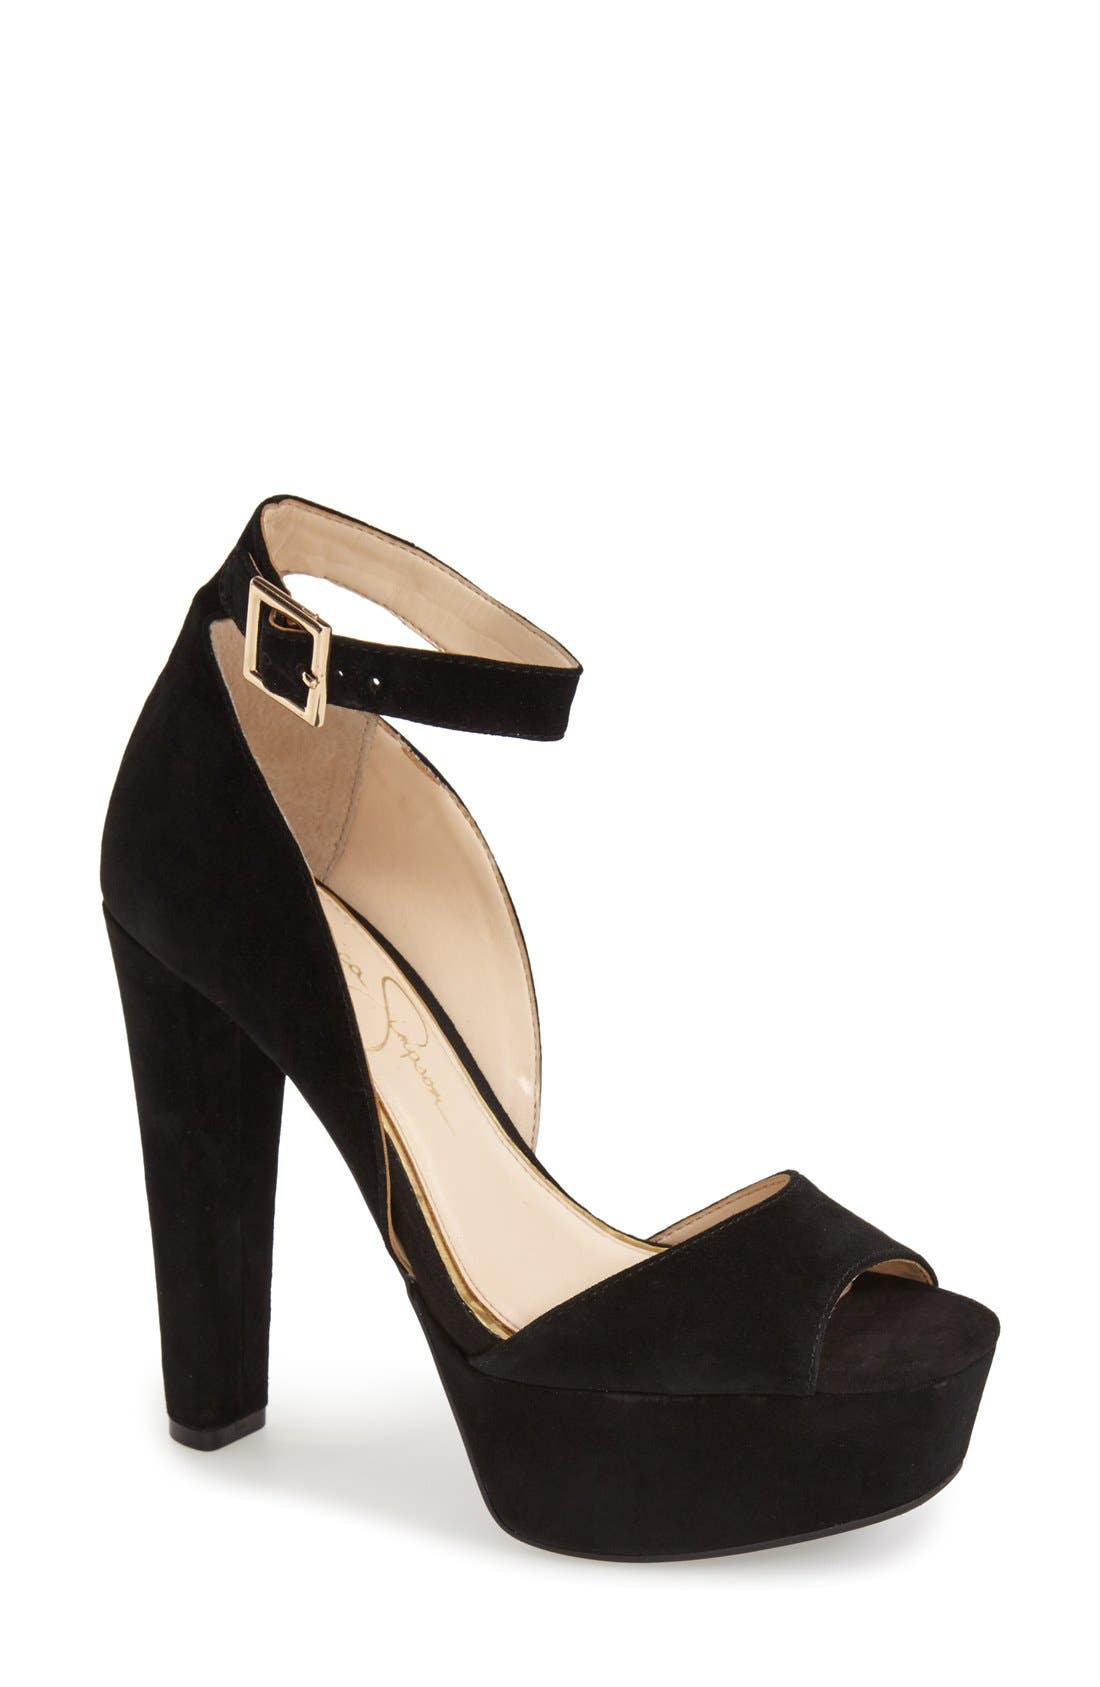 Alternate Image 1 Selected - Jessica Simpson 'Athens' Ankle Strap Platform Sandal (Women)